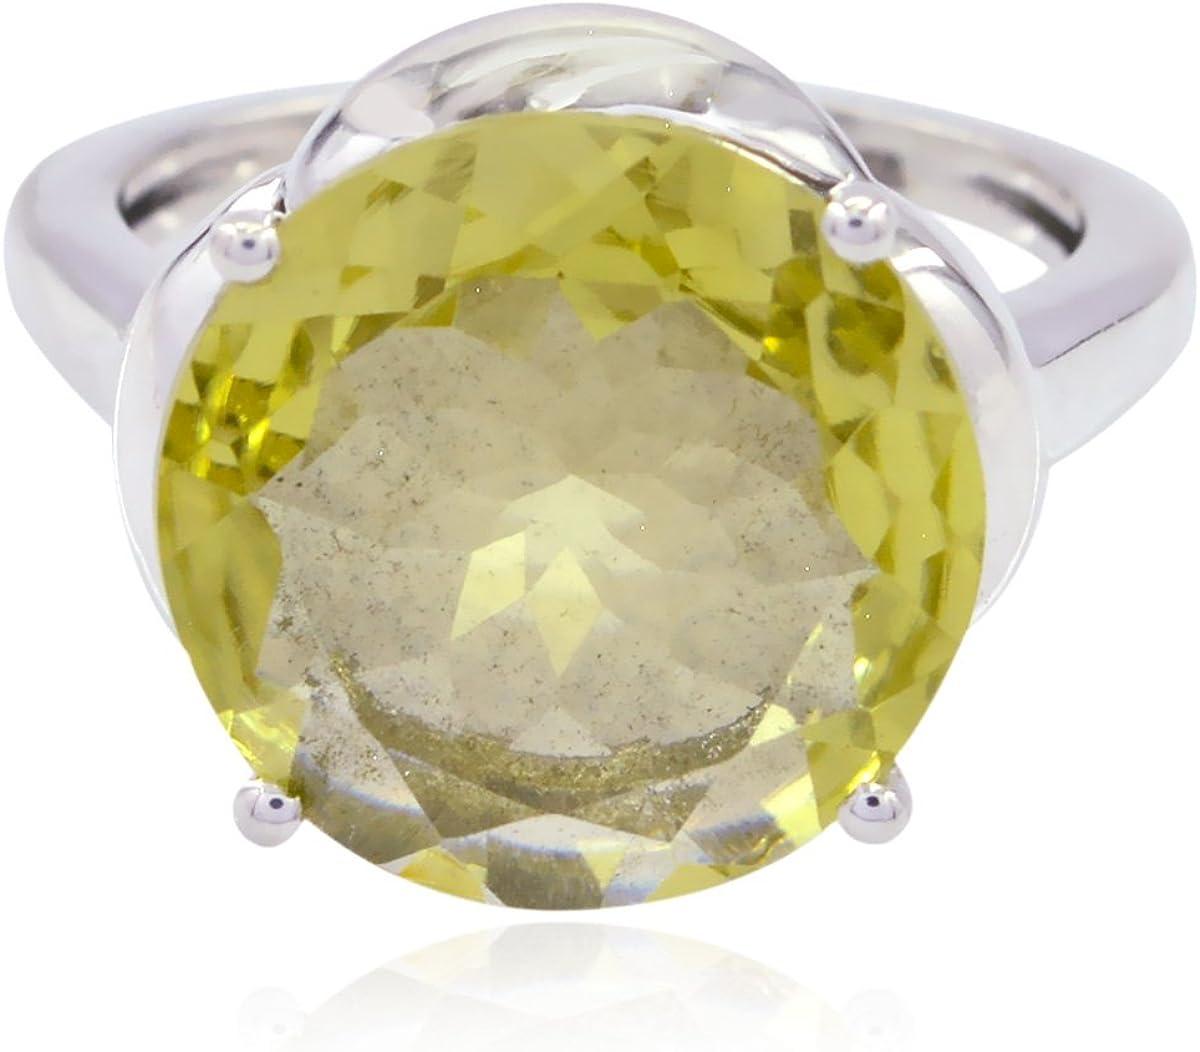 Supply Jewelry Greatest Seller Gift for Mother Rings 925 Silver Yellow Lemon Quartz Genuine Gems Ring Genuine Gems Round Faceted Lemon Quartz Ring